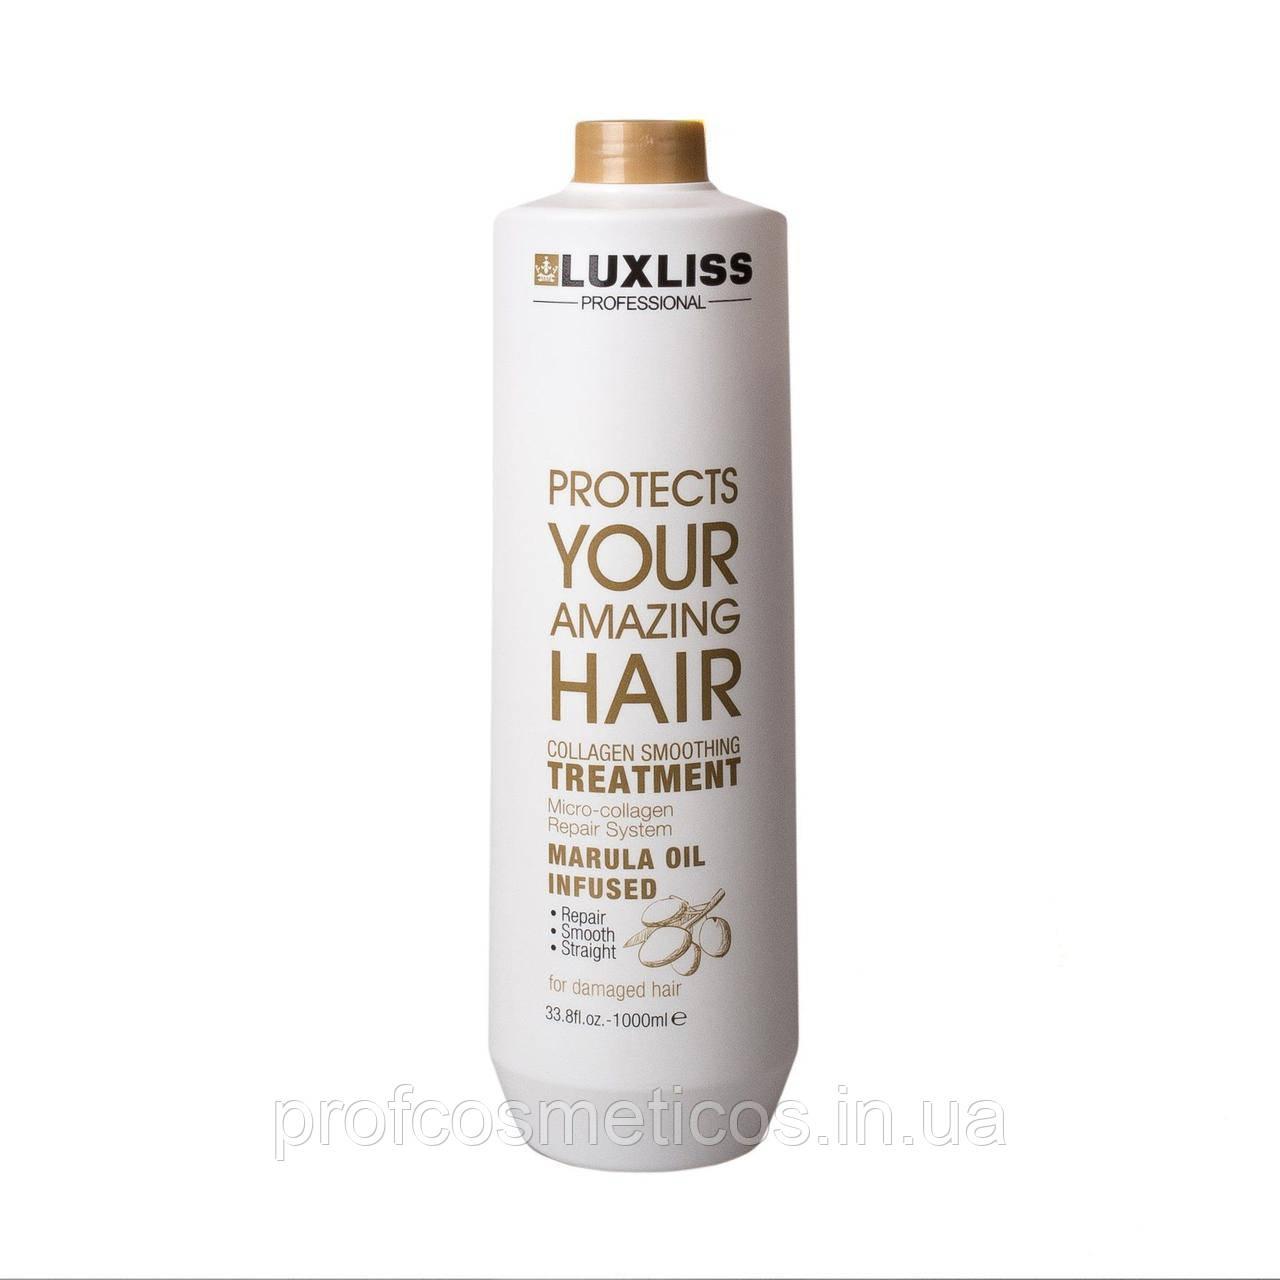 Ботокс для волос от бренда Люкслисс Collagen Smoothing Repair System 1000ml